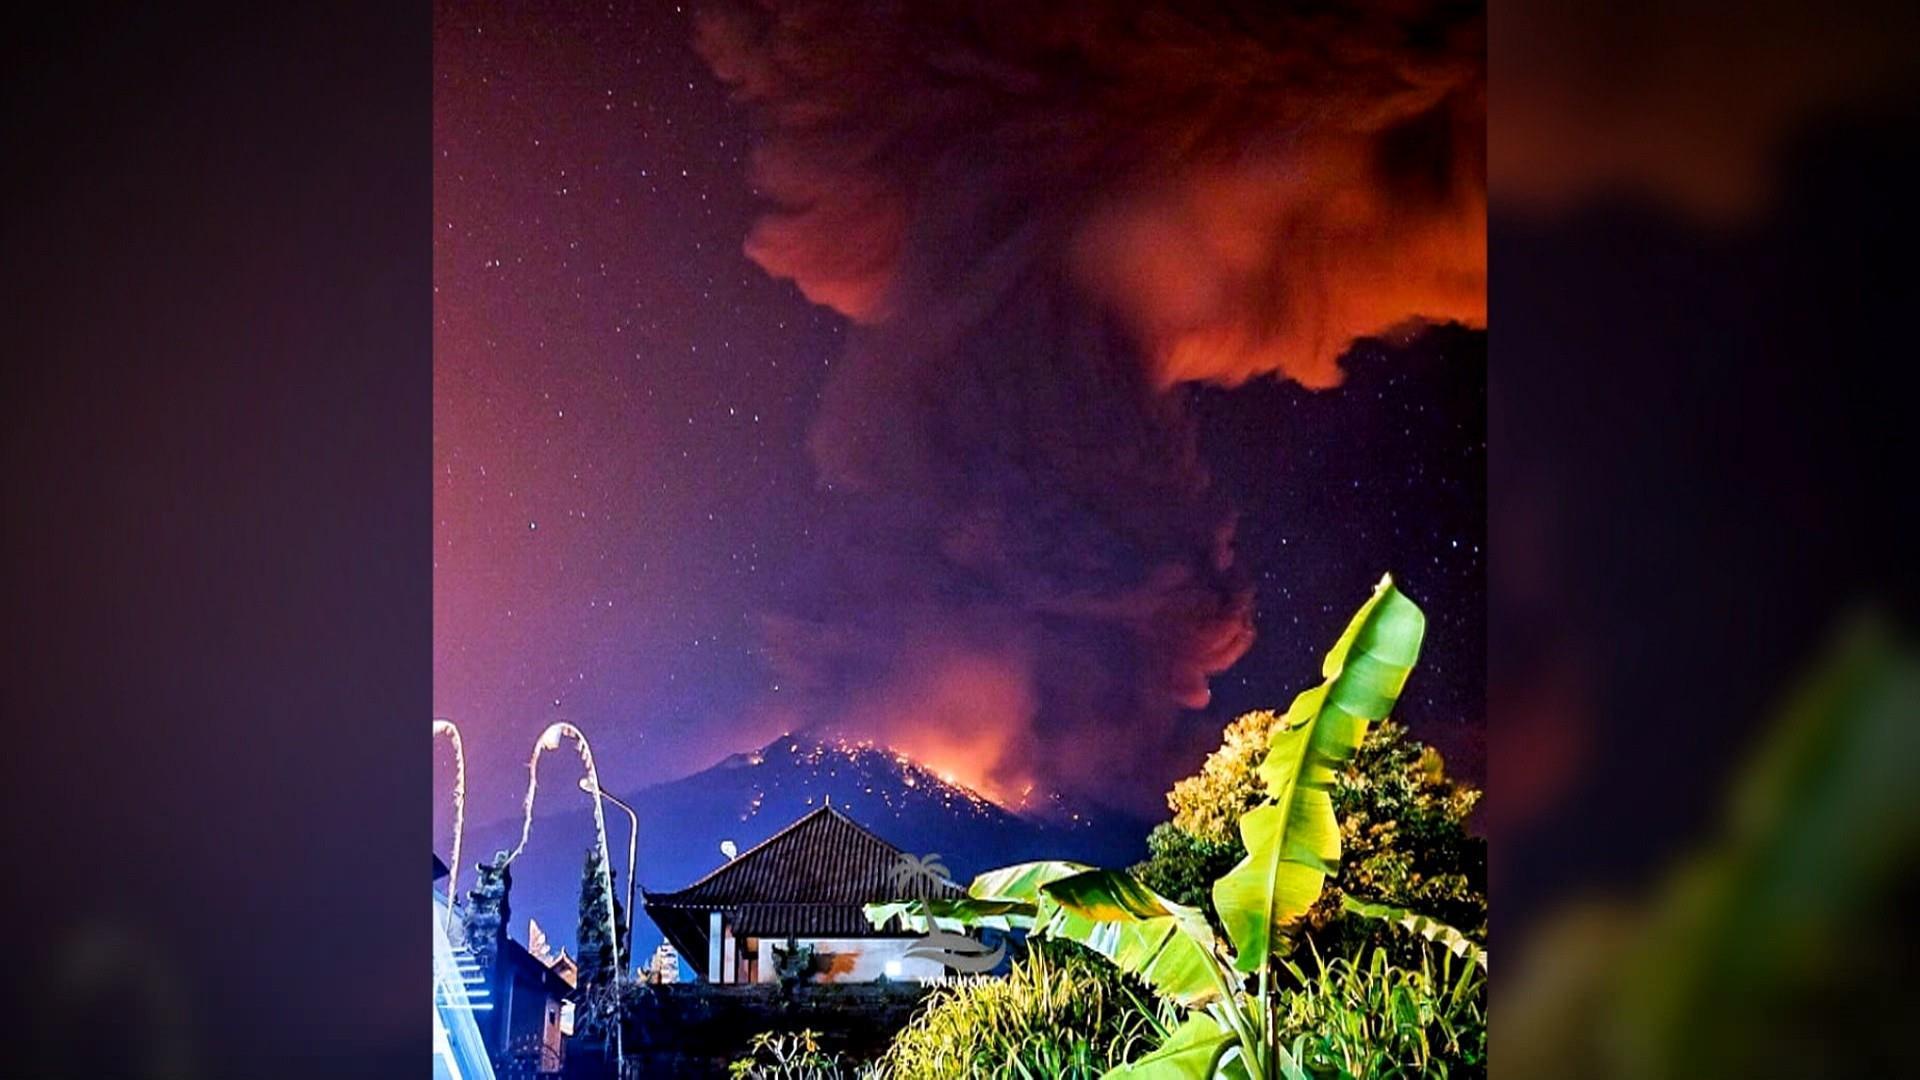 Volcano erupts on island of Bali, canceling flights